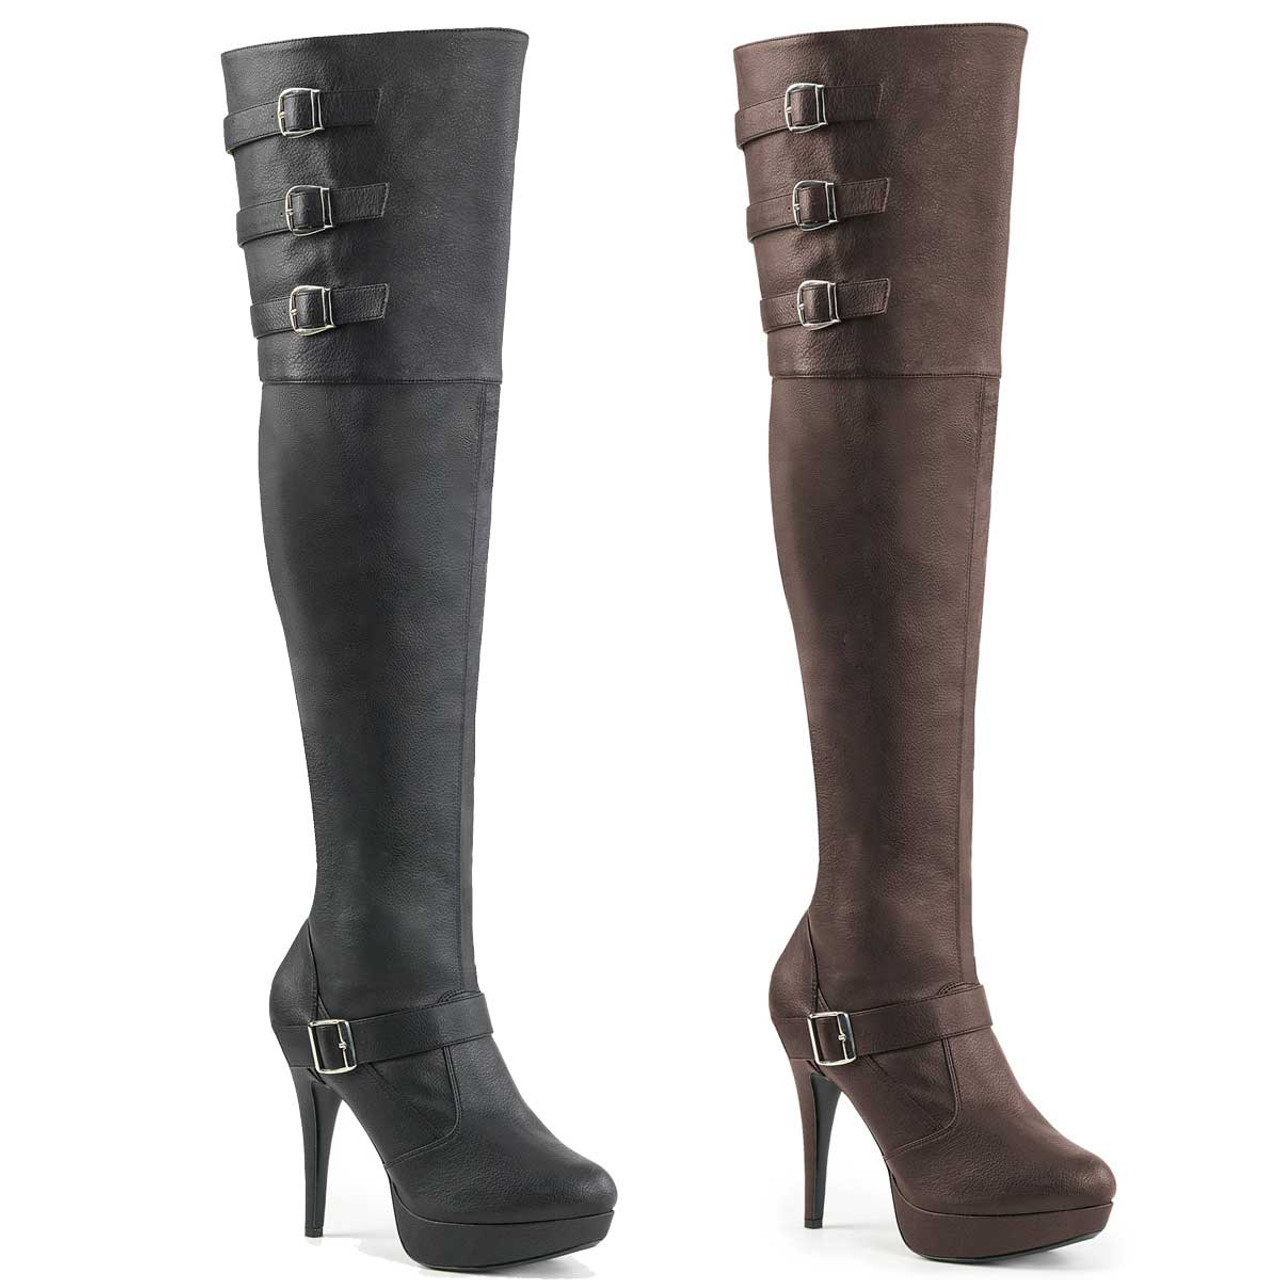 Pink Label | Chloe 308, Wide Shaft Closet Queen Thigh High Boots